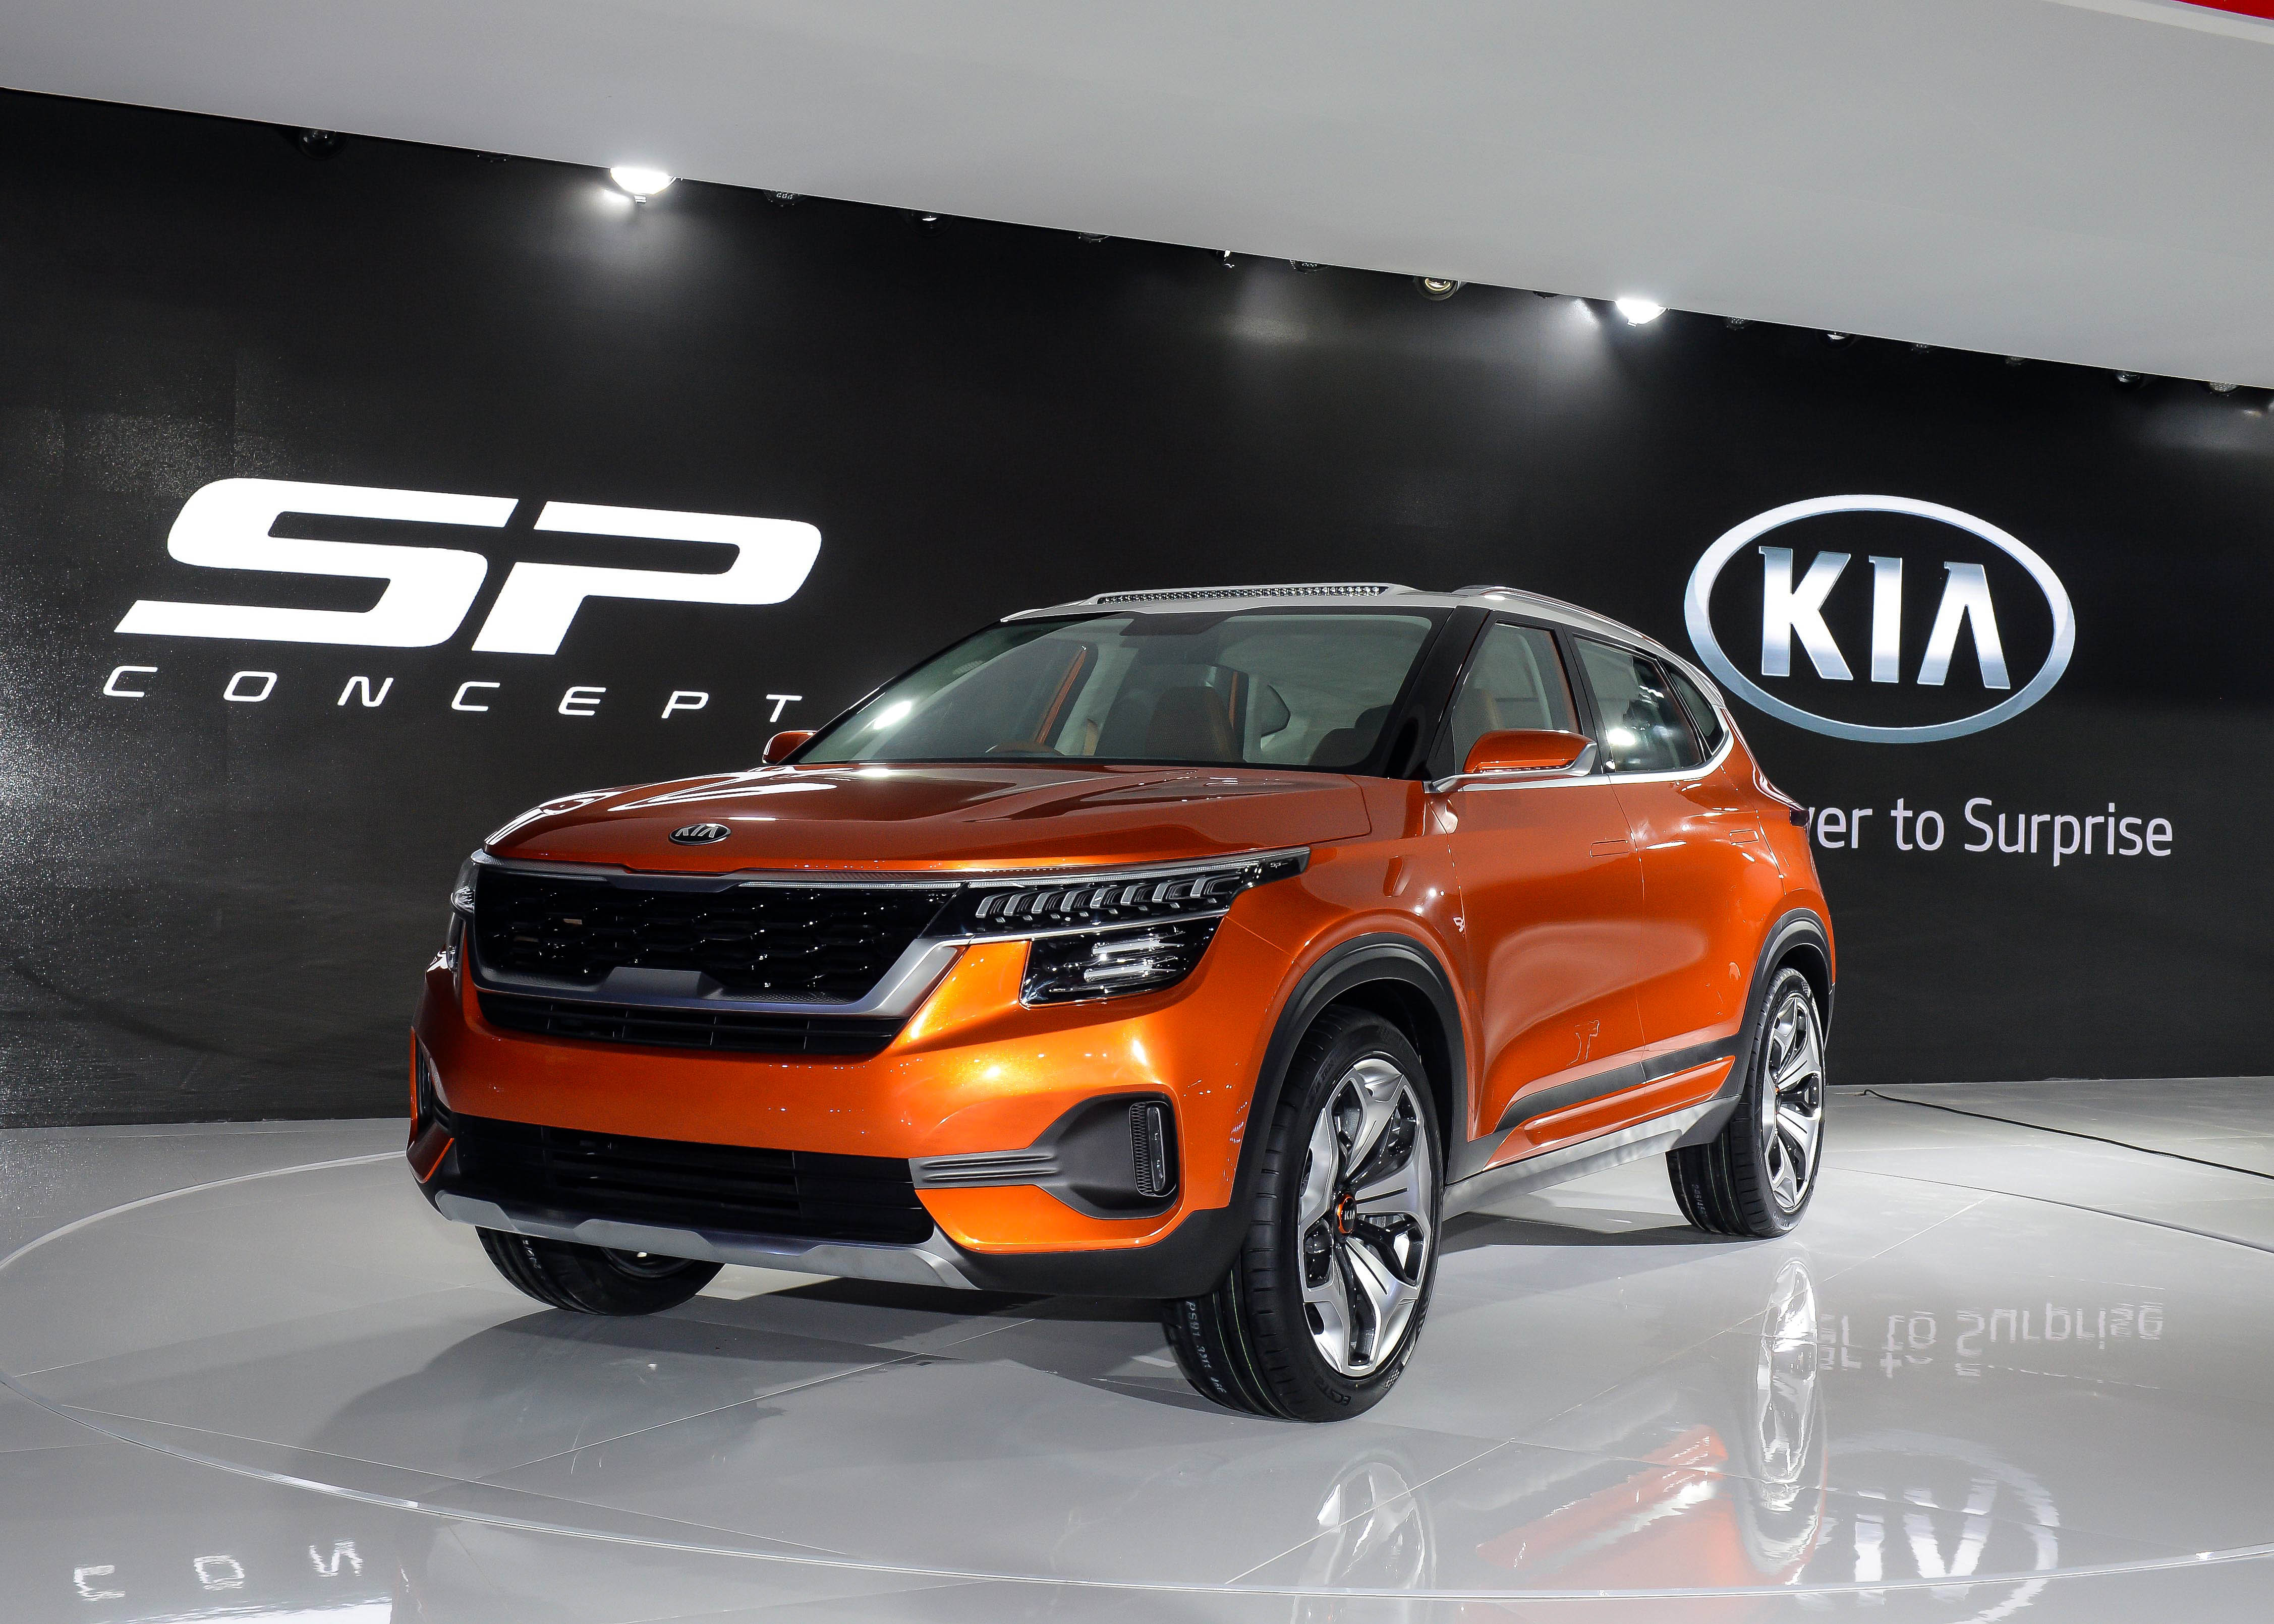 Kia SP SUV Showcased at AutoExpo 2018